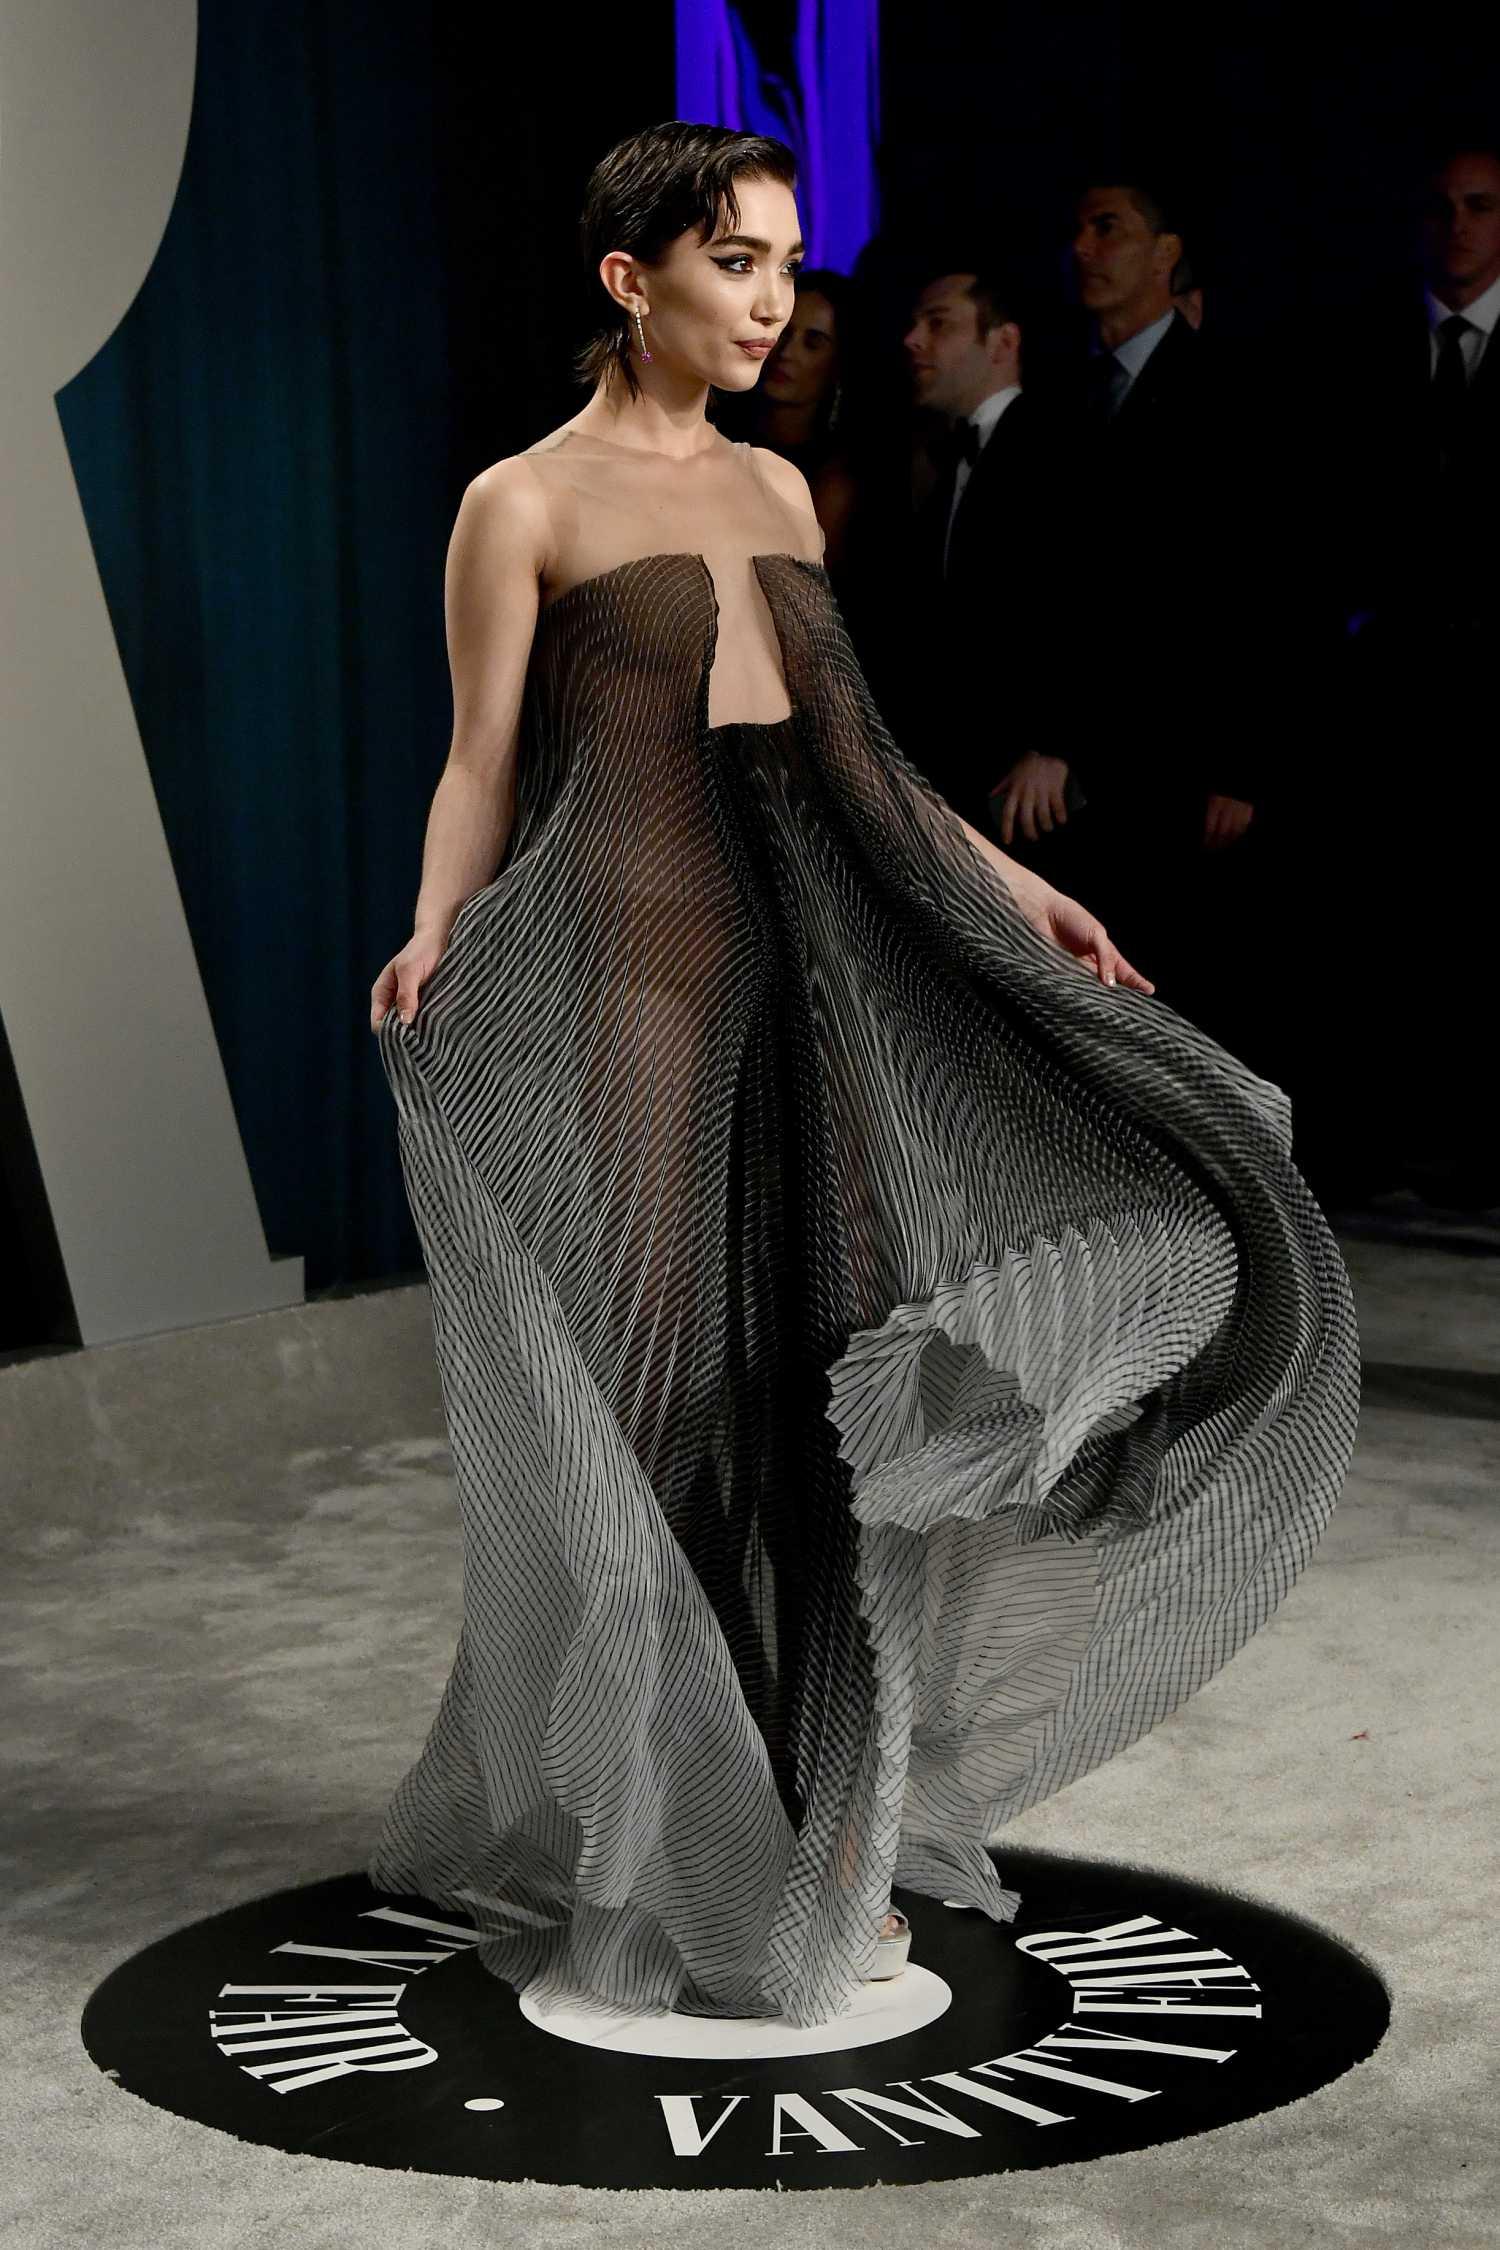 Rowan Blanchard Attends the 92nd Academy Awards Vanity